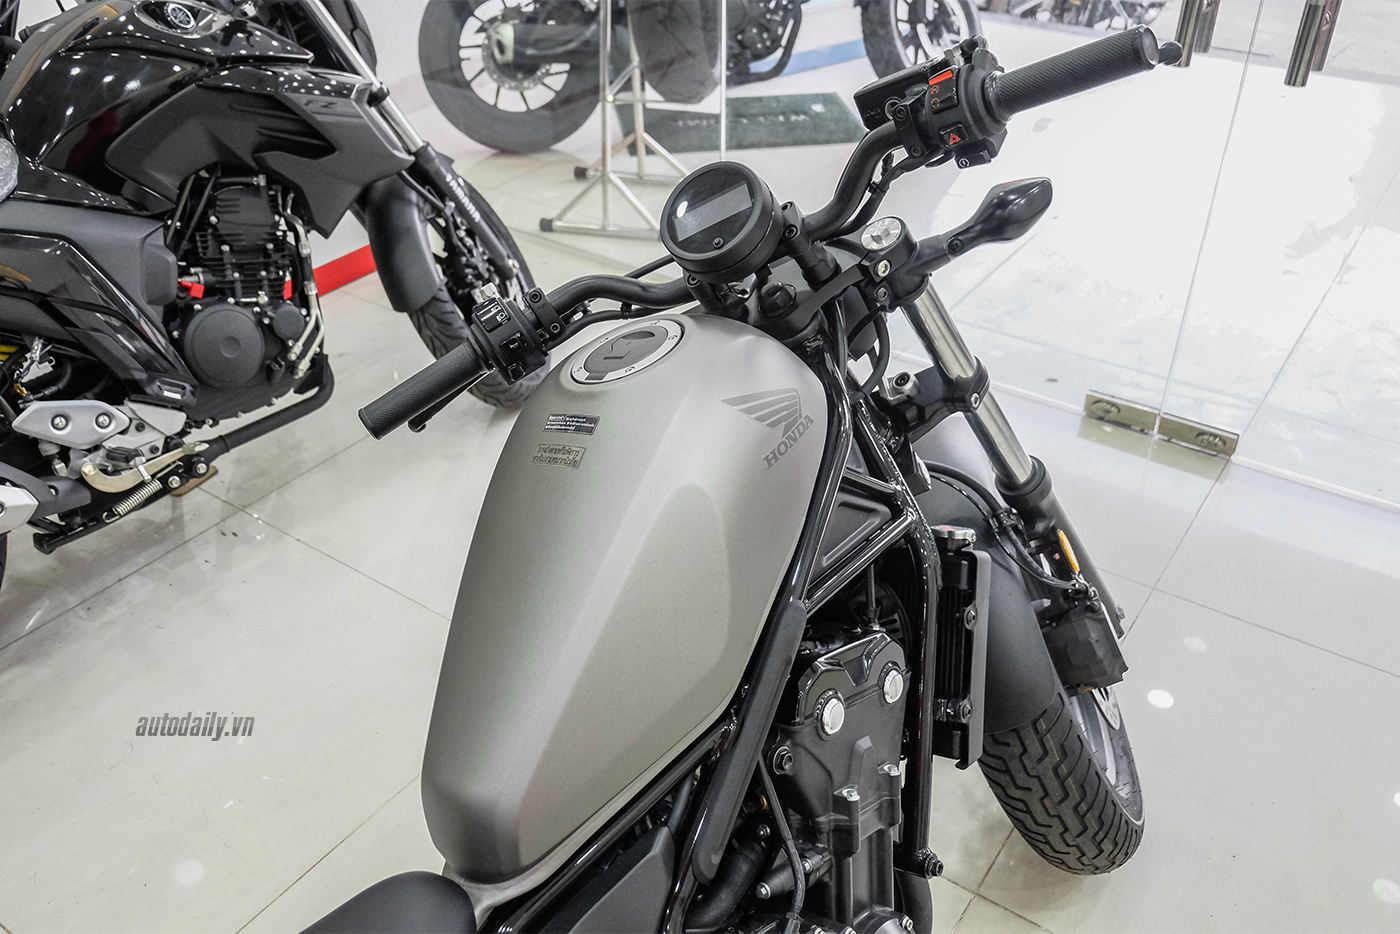 honda-rebel-500-abs-2017-11-1.jpg